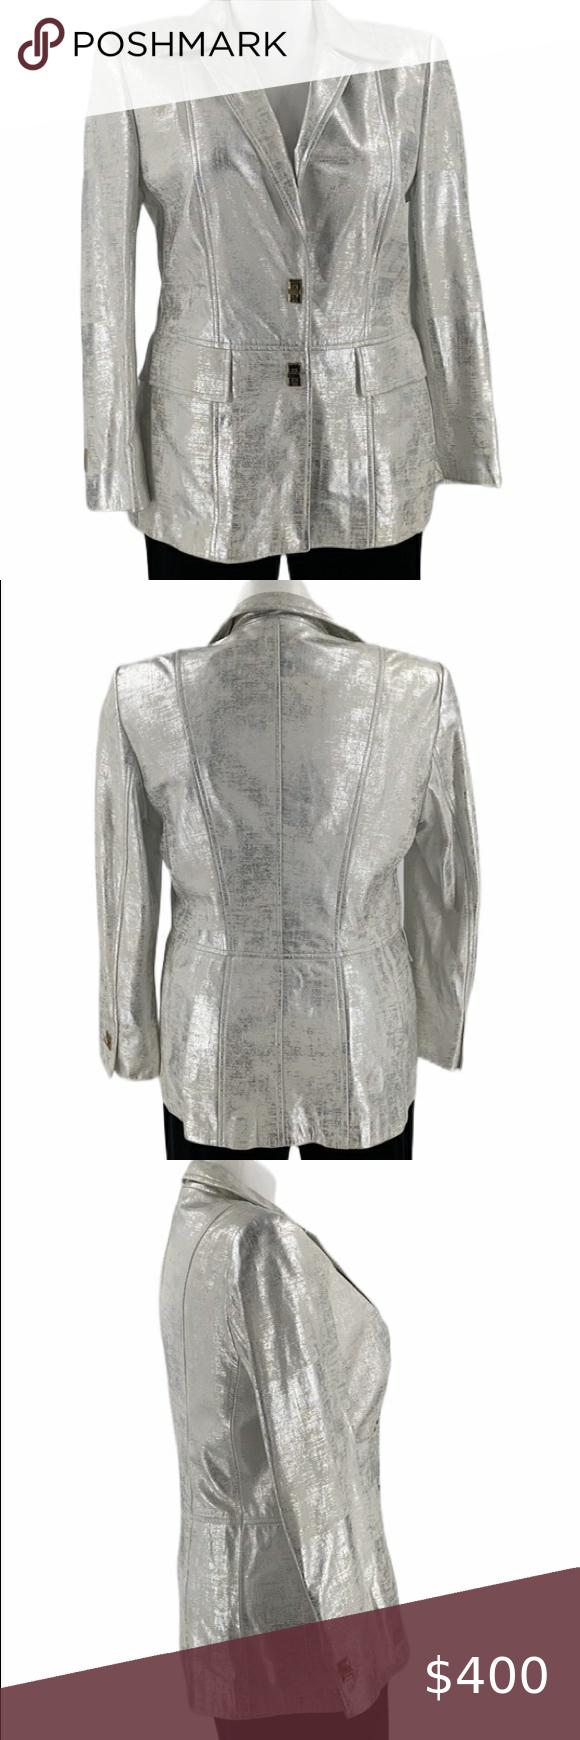 Escada Leather Silver Shiny Jacket Blazer Top X L Escada Leather Jacket Soft And Supple And Lined Signs Of Wea Shiny Jacket Lamb Leather Jacket Leather Jacket [ 1740 x 580 Pixel ]